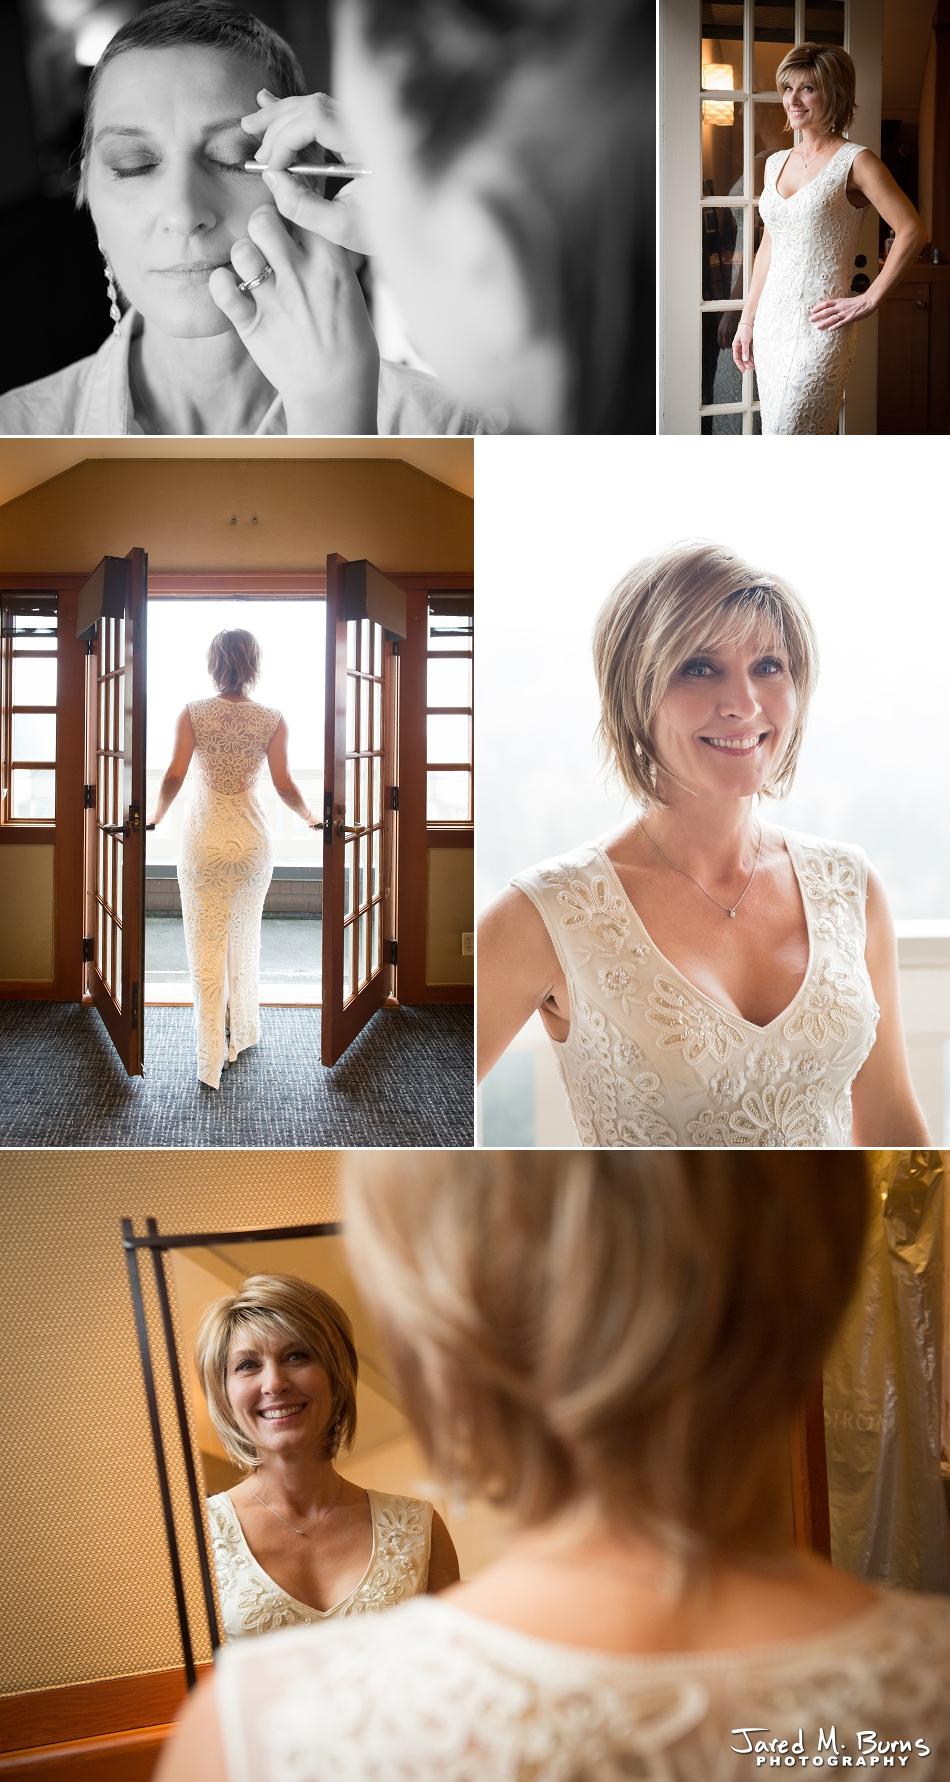 Salish Lodge at Snoqualmie Falls Winter Wedding - Jared M. Burns Photography (2)